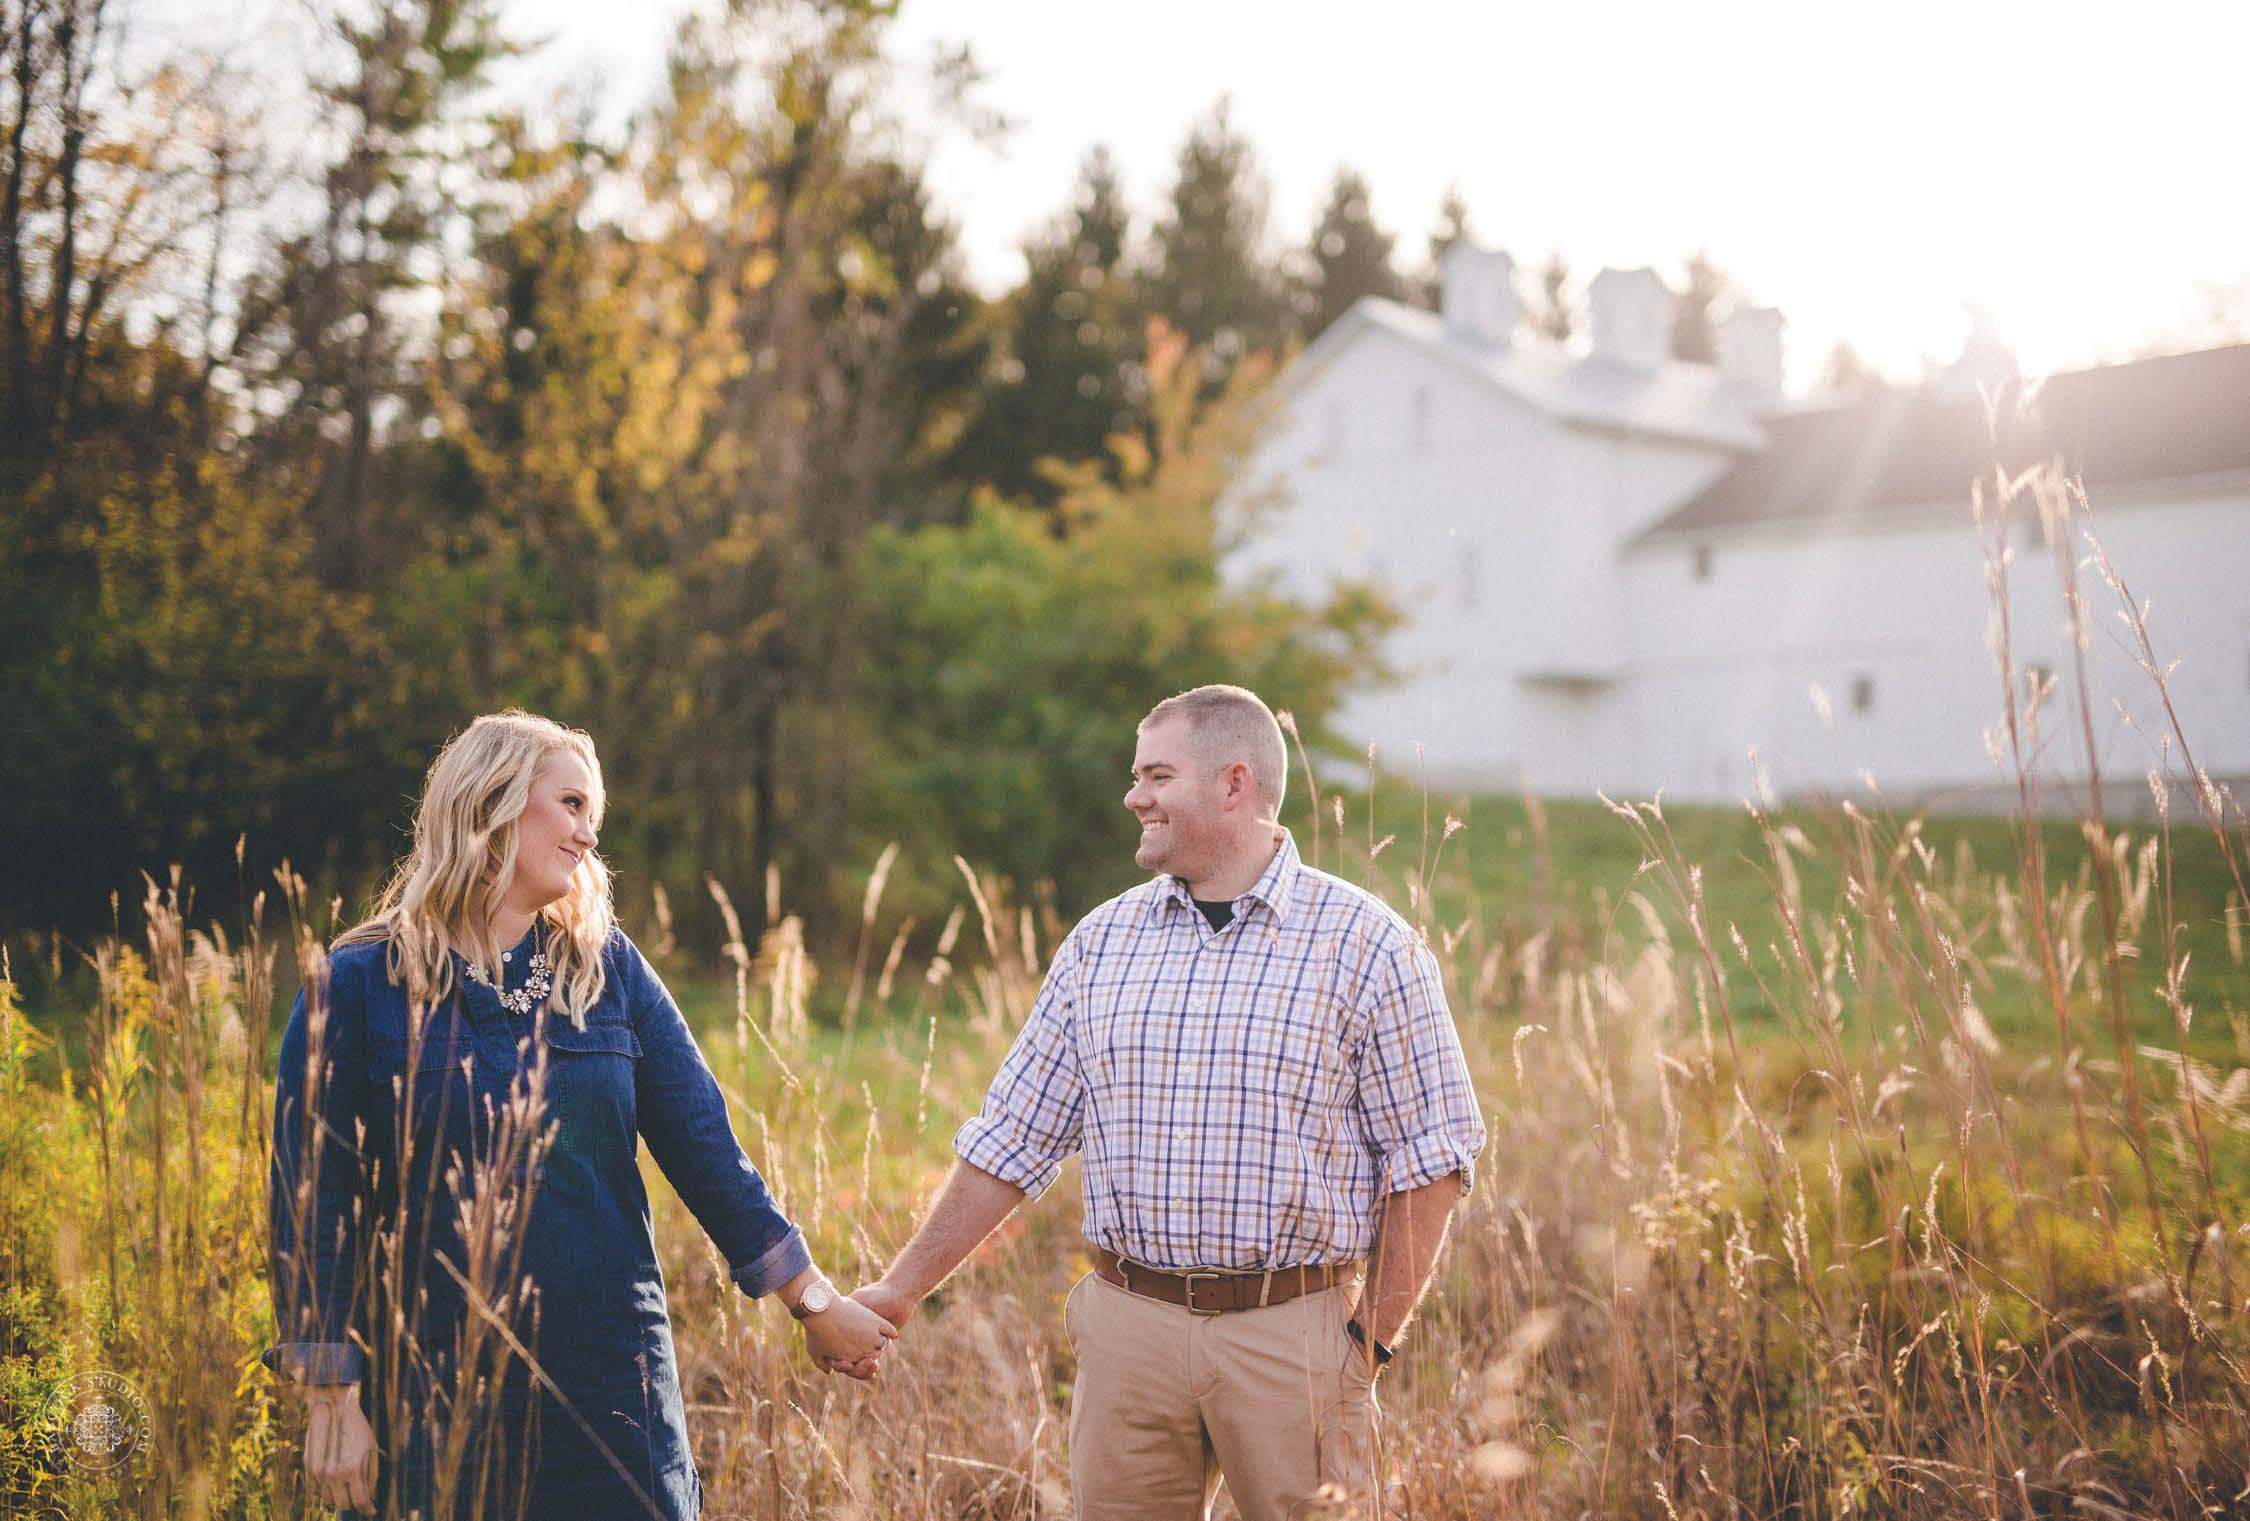 sarah-justin-engagement-photographer-dayton-ohio-.jpg